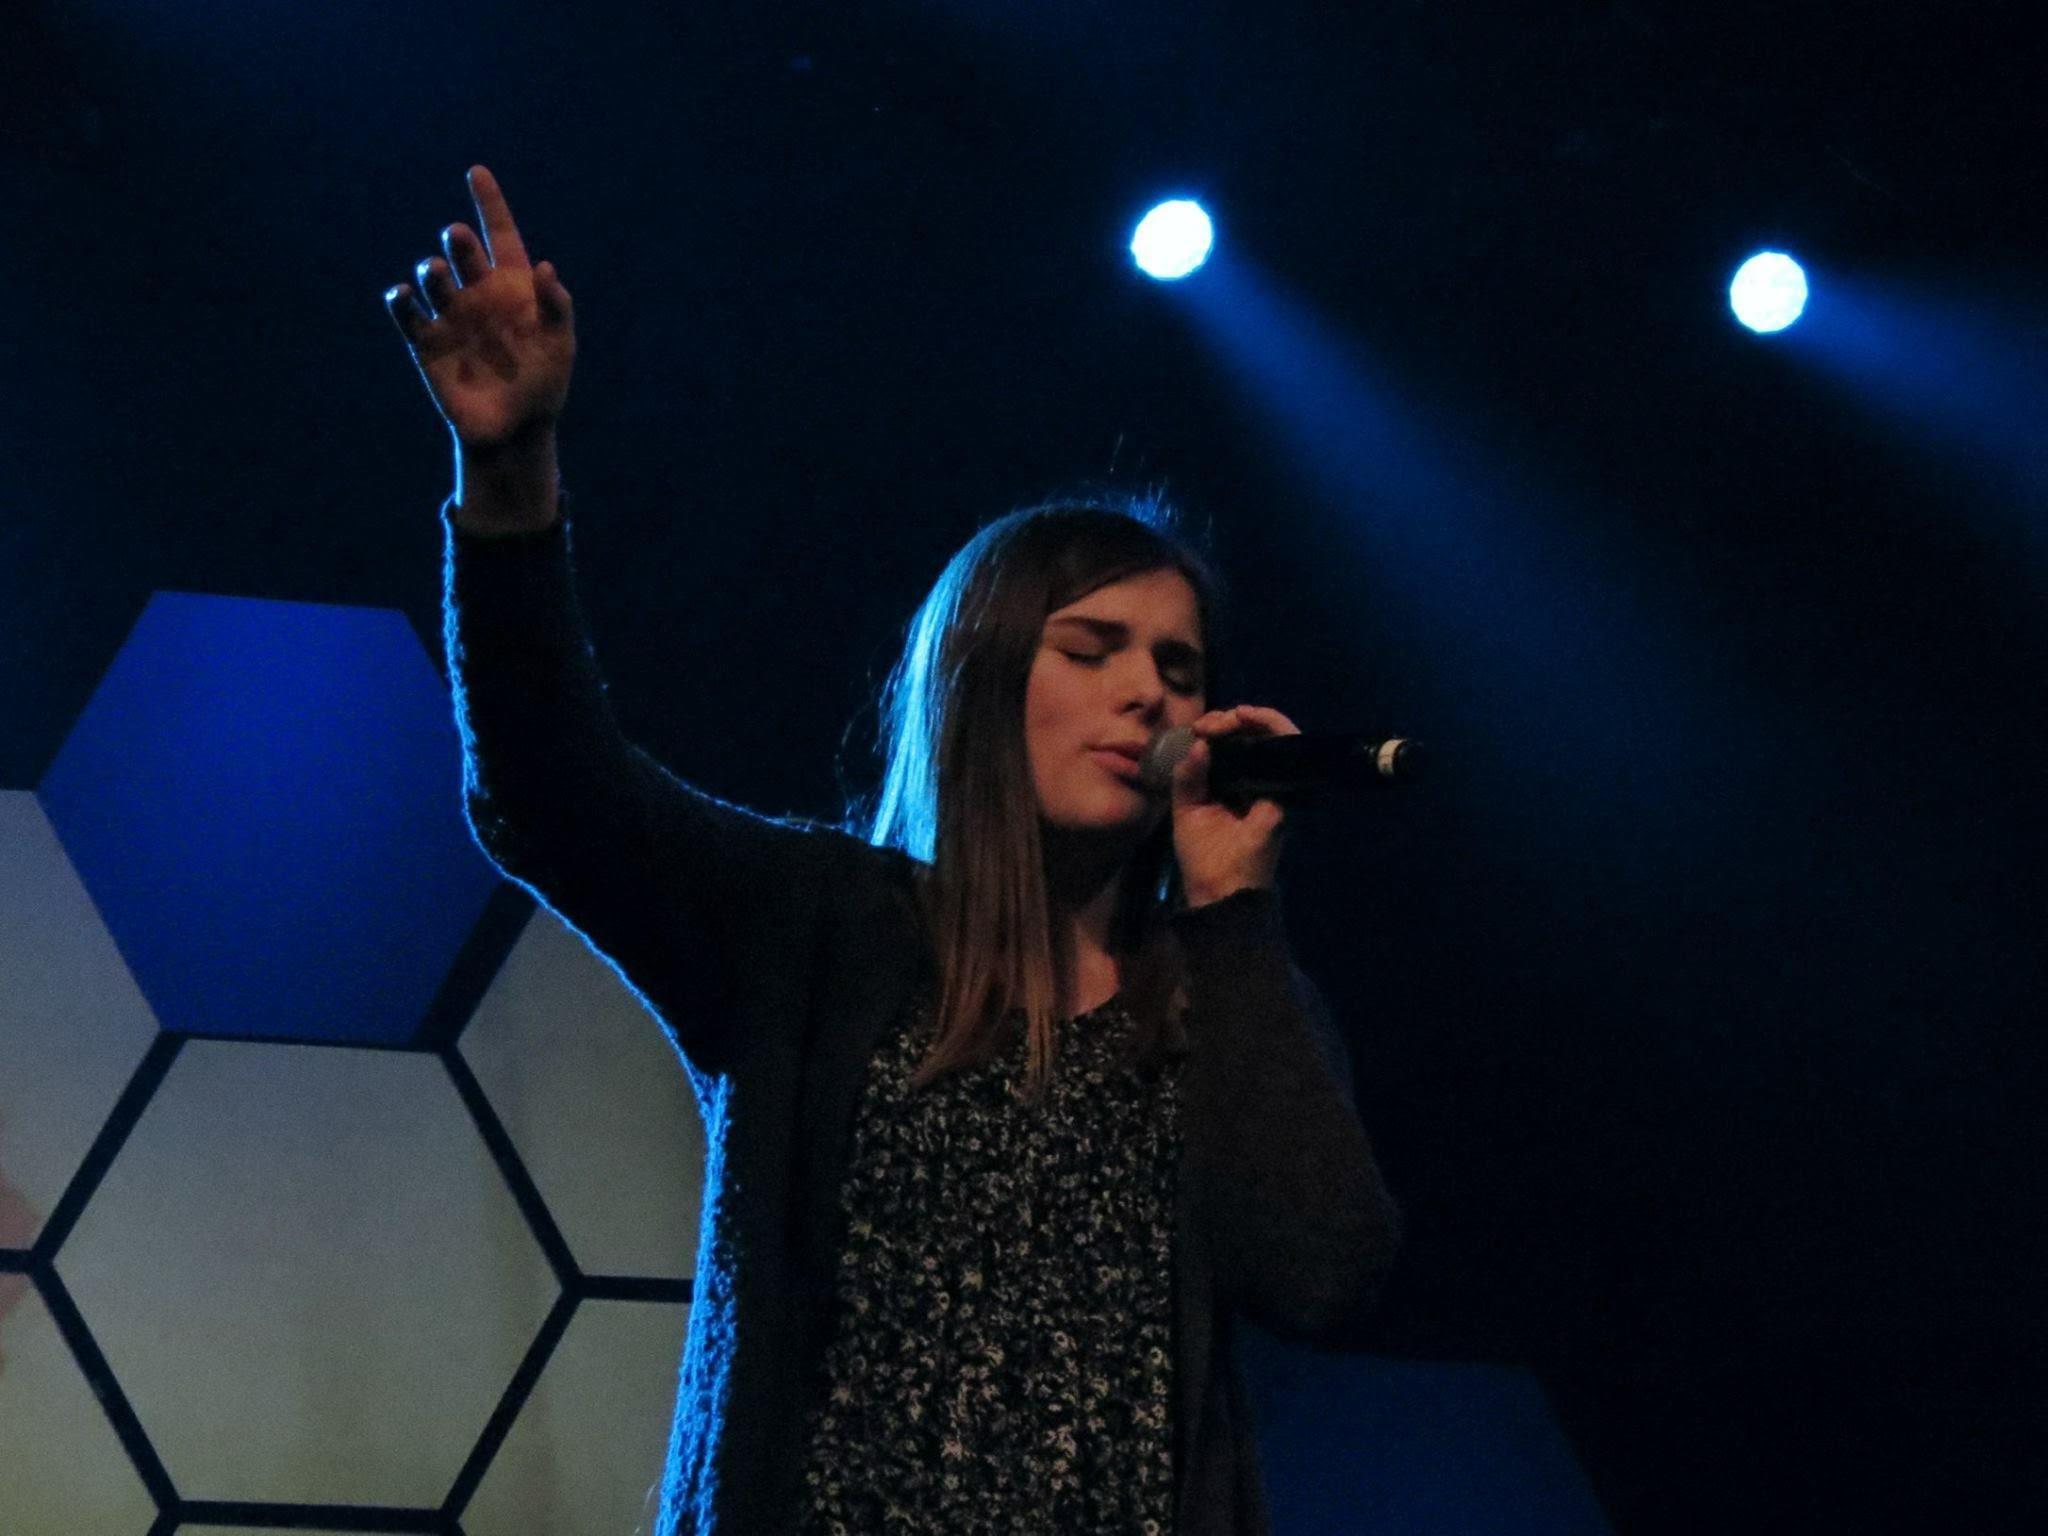 Amanda Riffe is uniting students with hope